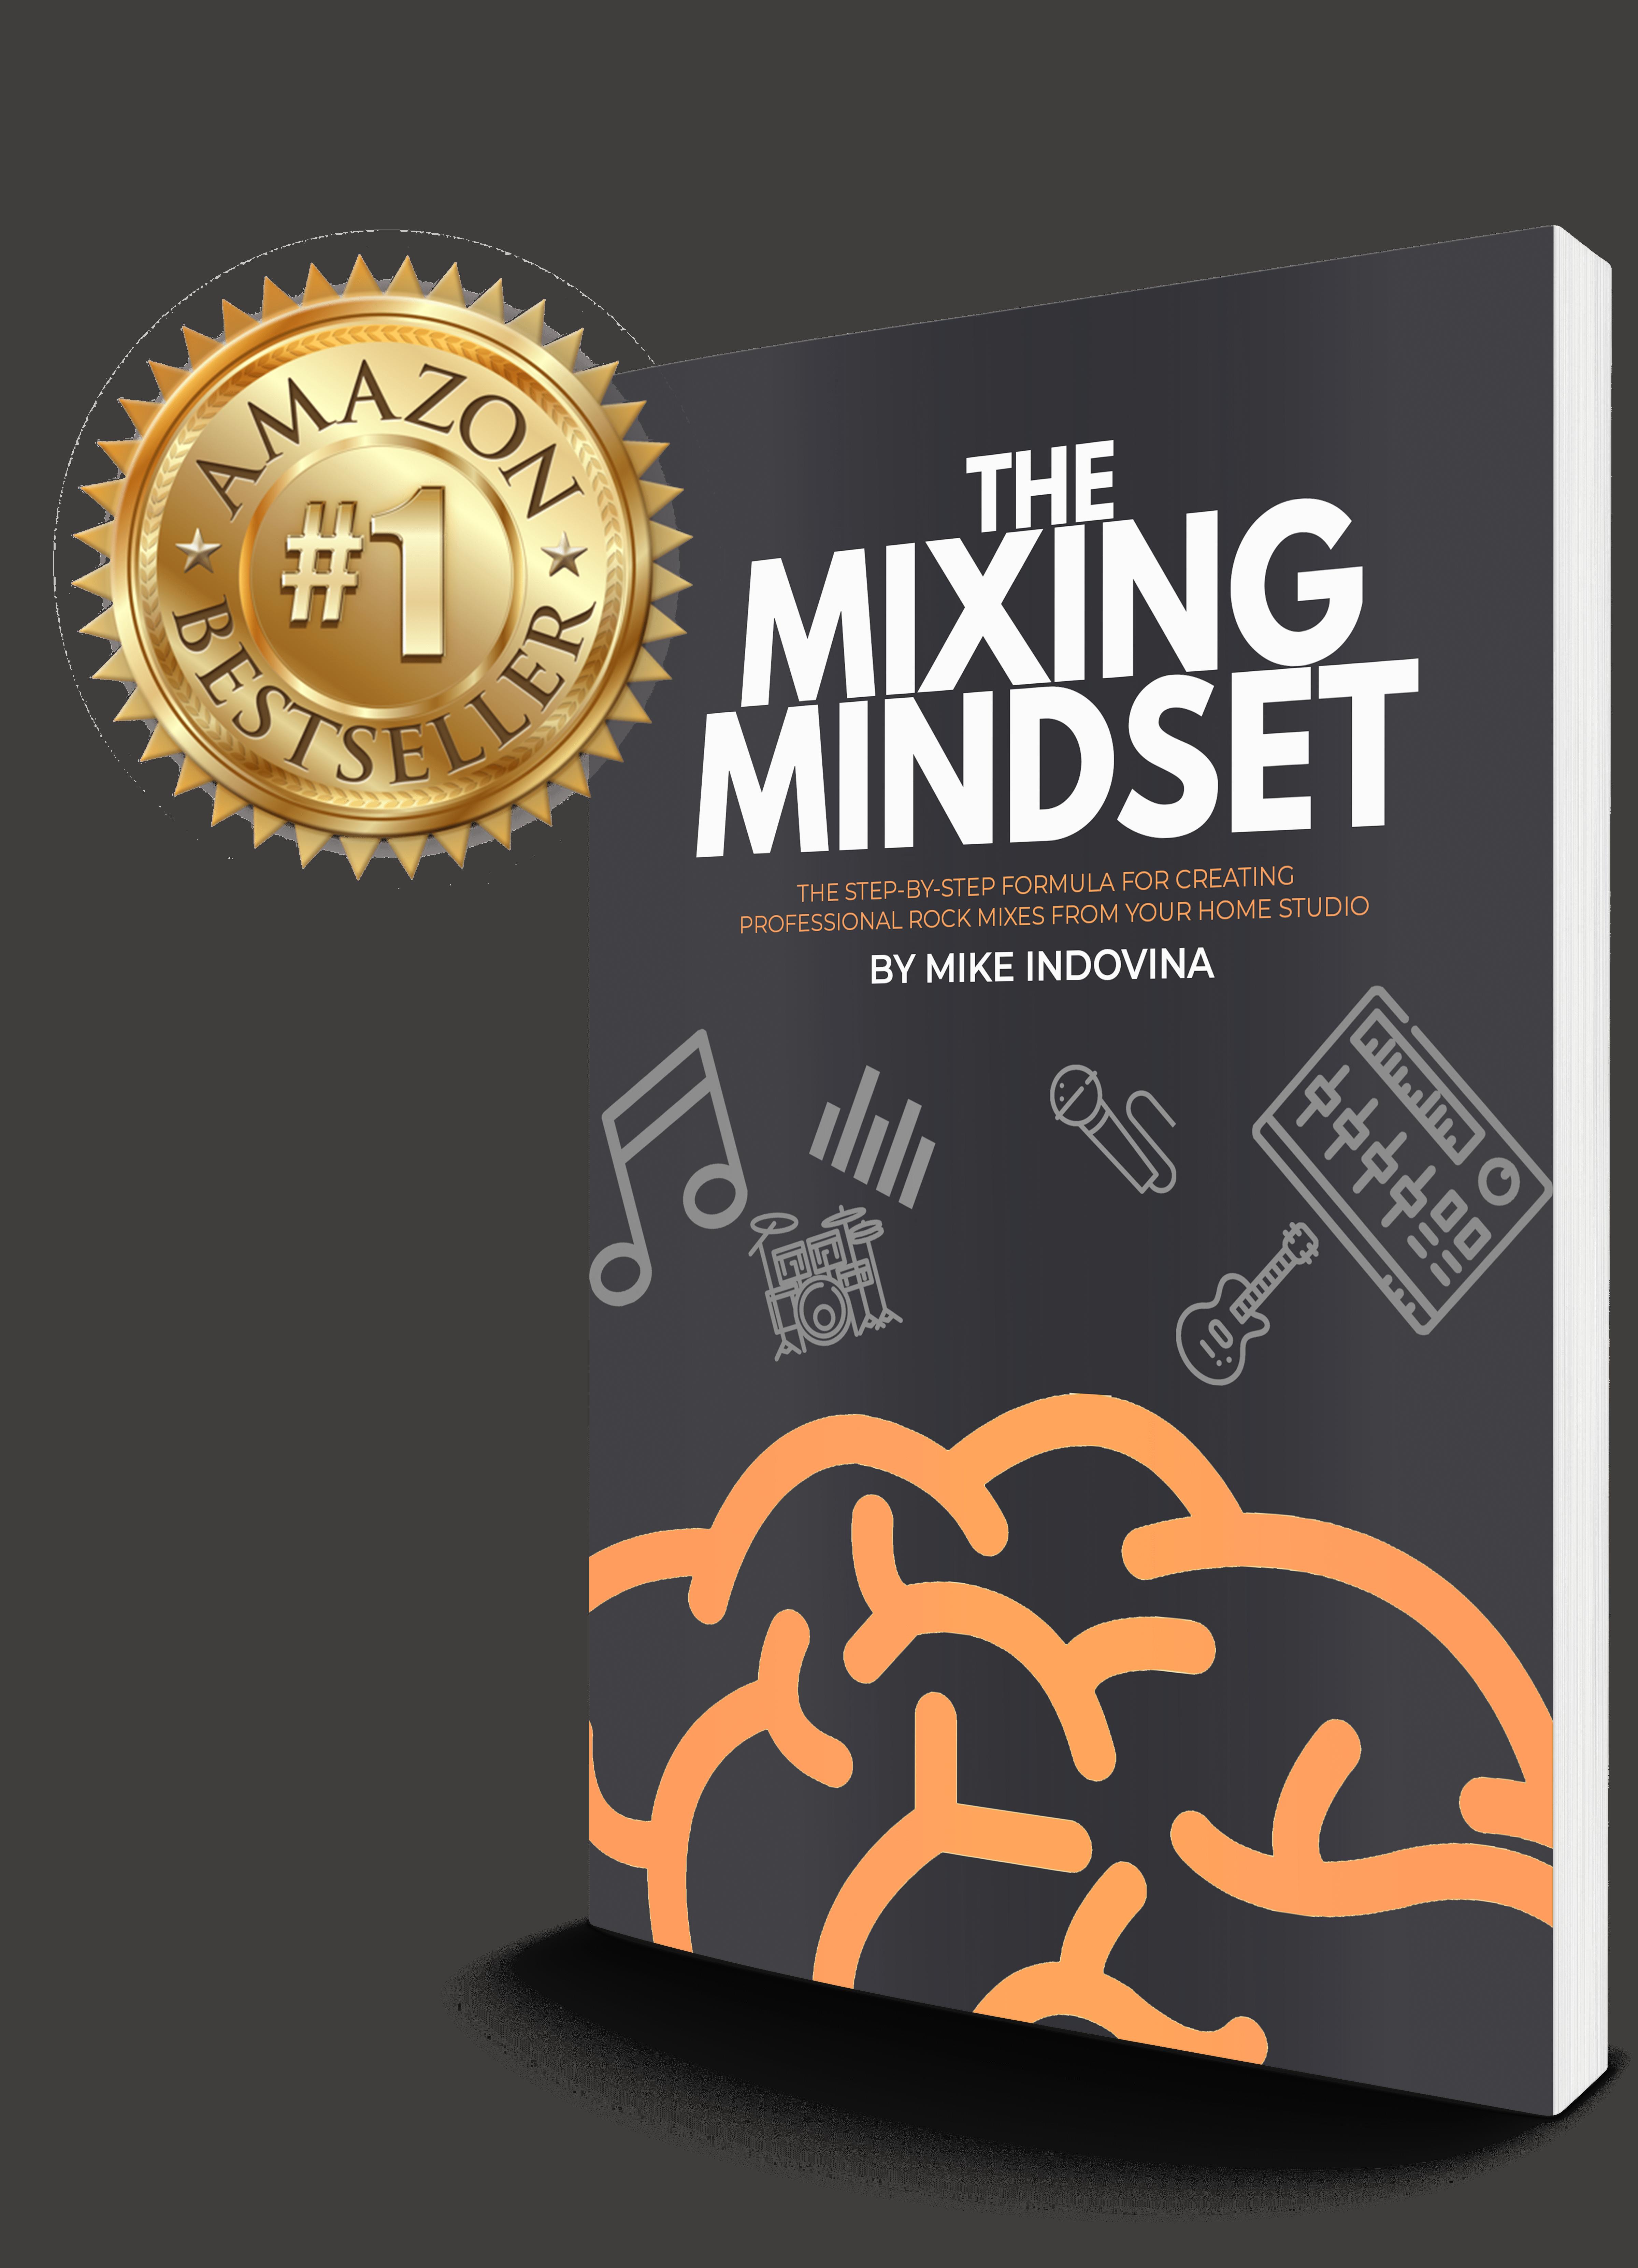 The Mixing Mindset